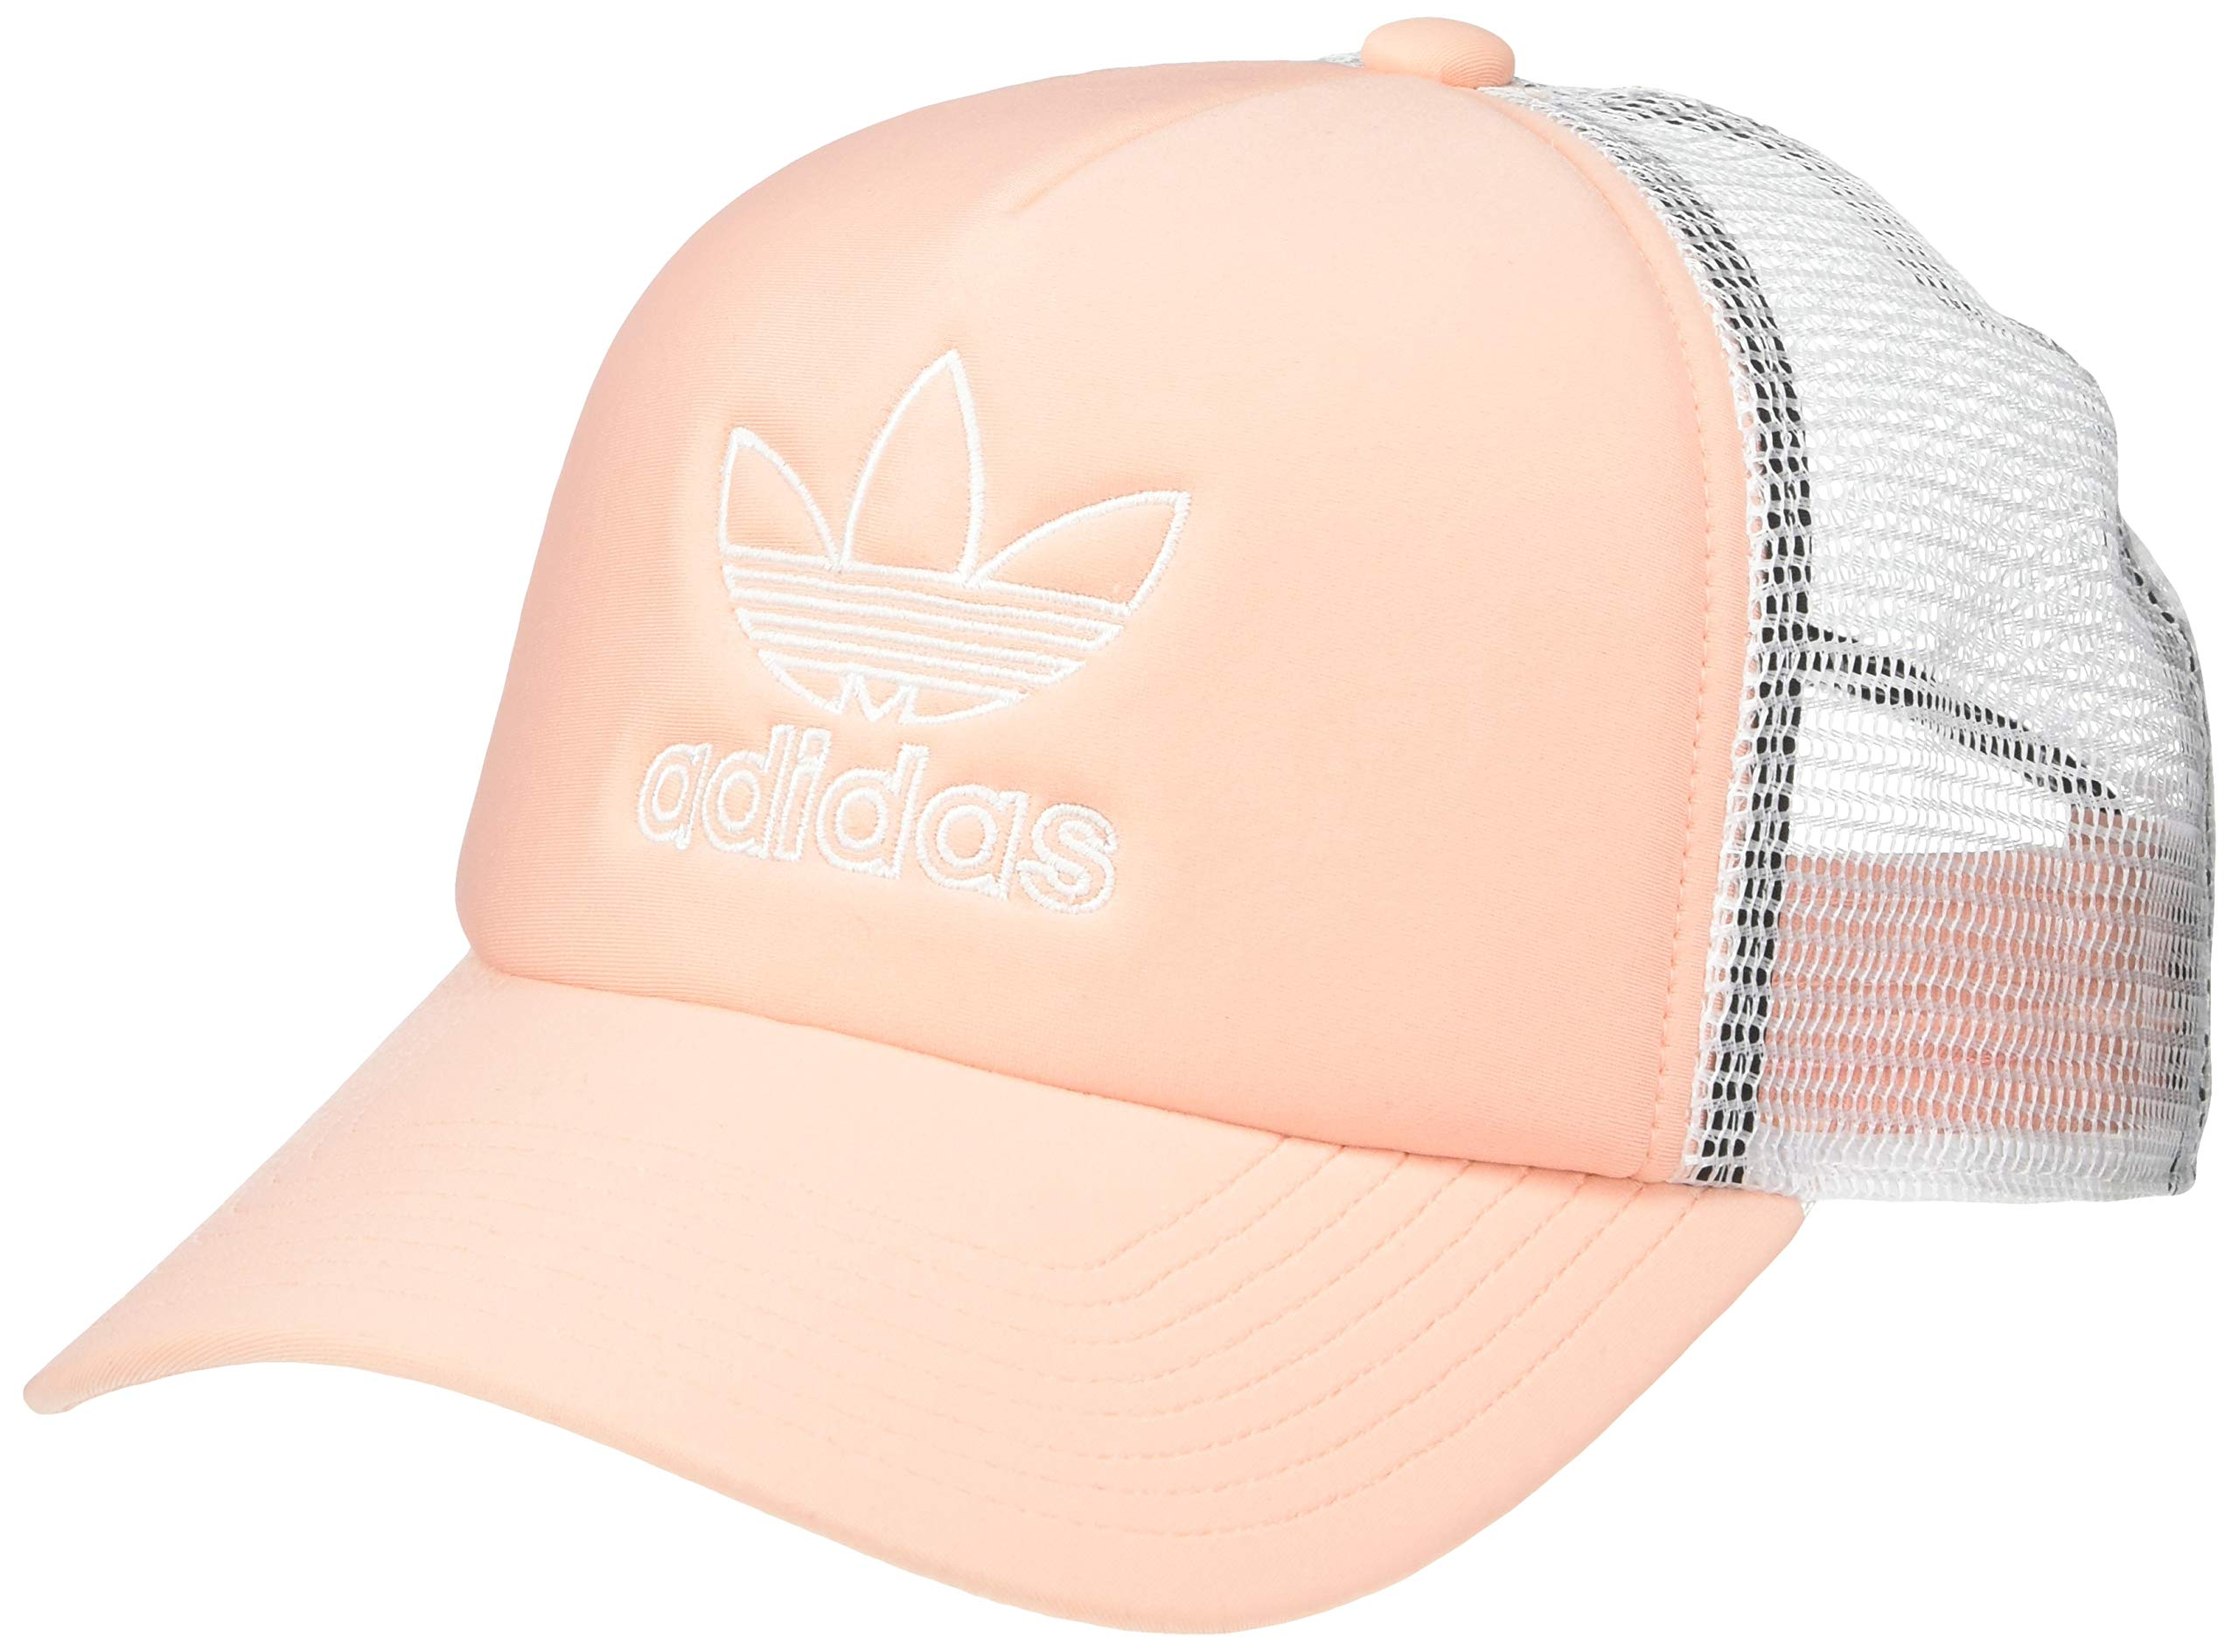 adidas Women's Originals Foam Trucker Cap, Dust Pink/White, One Size